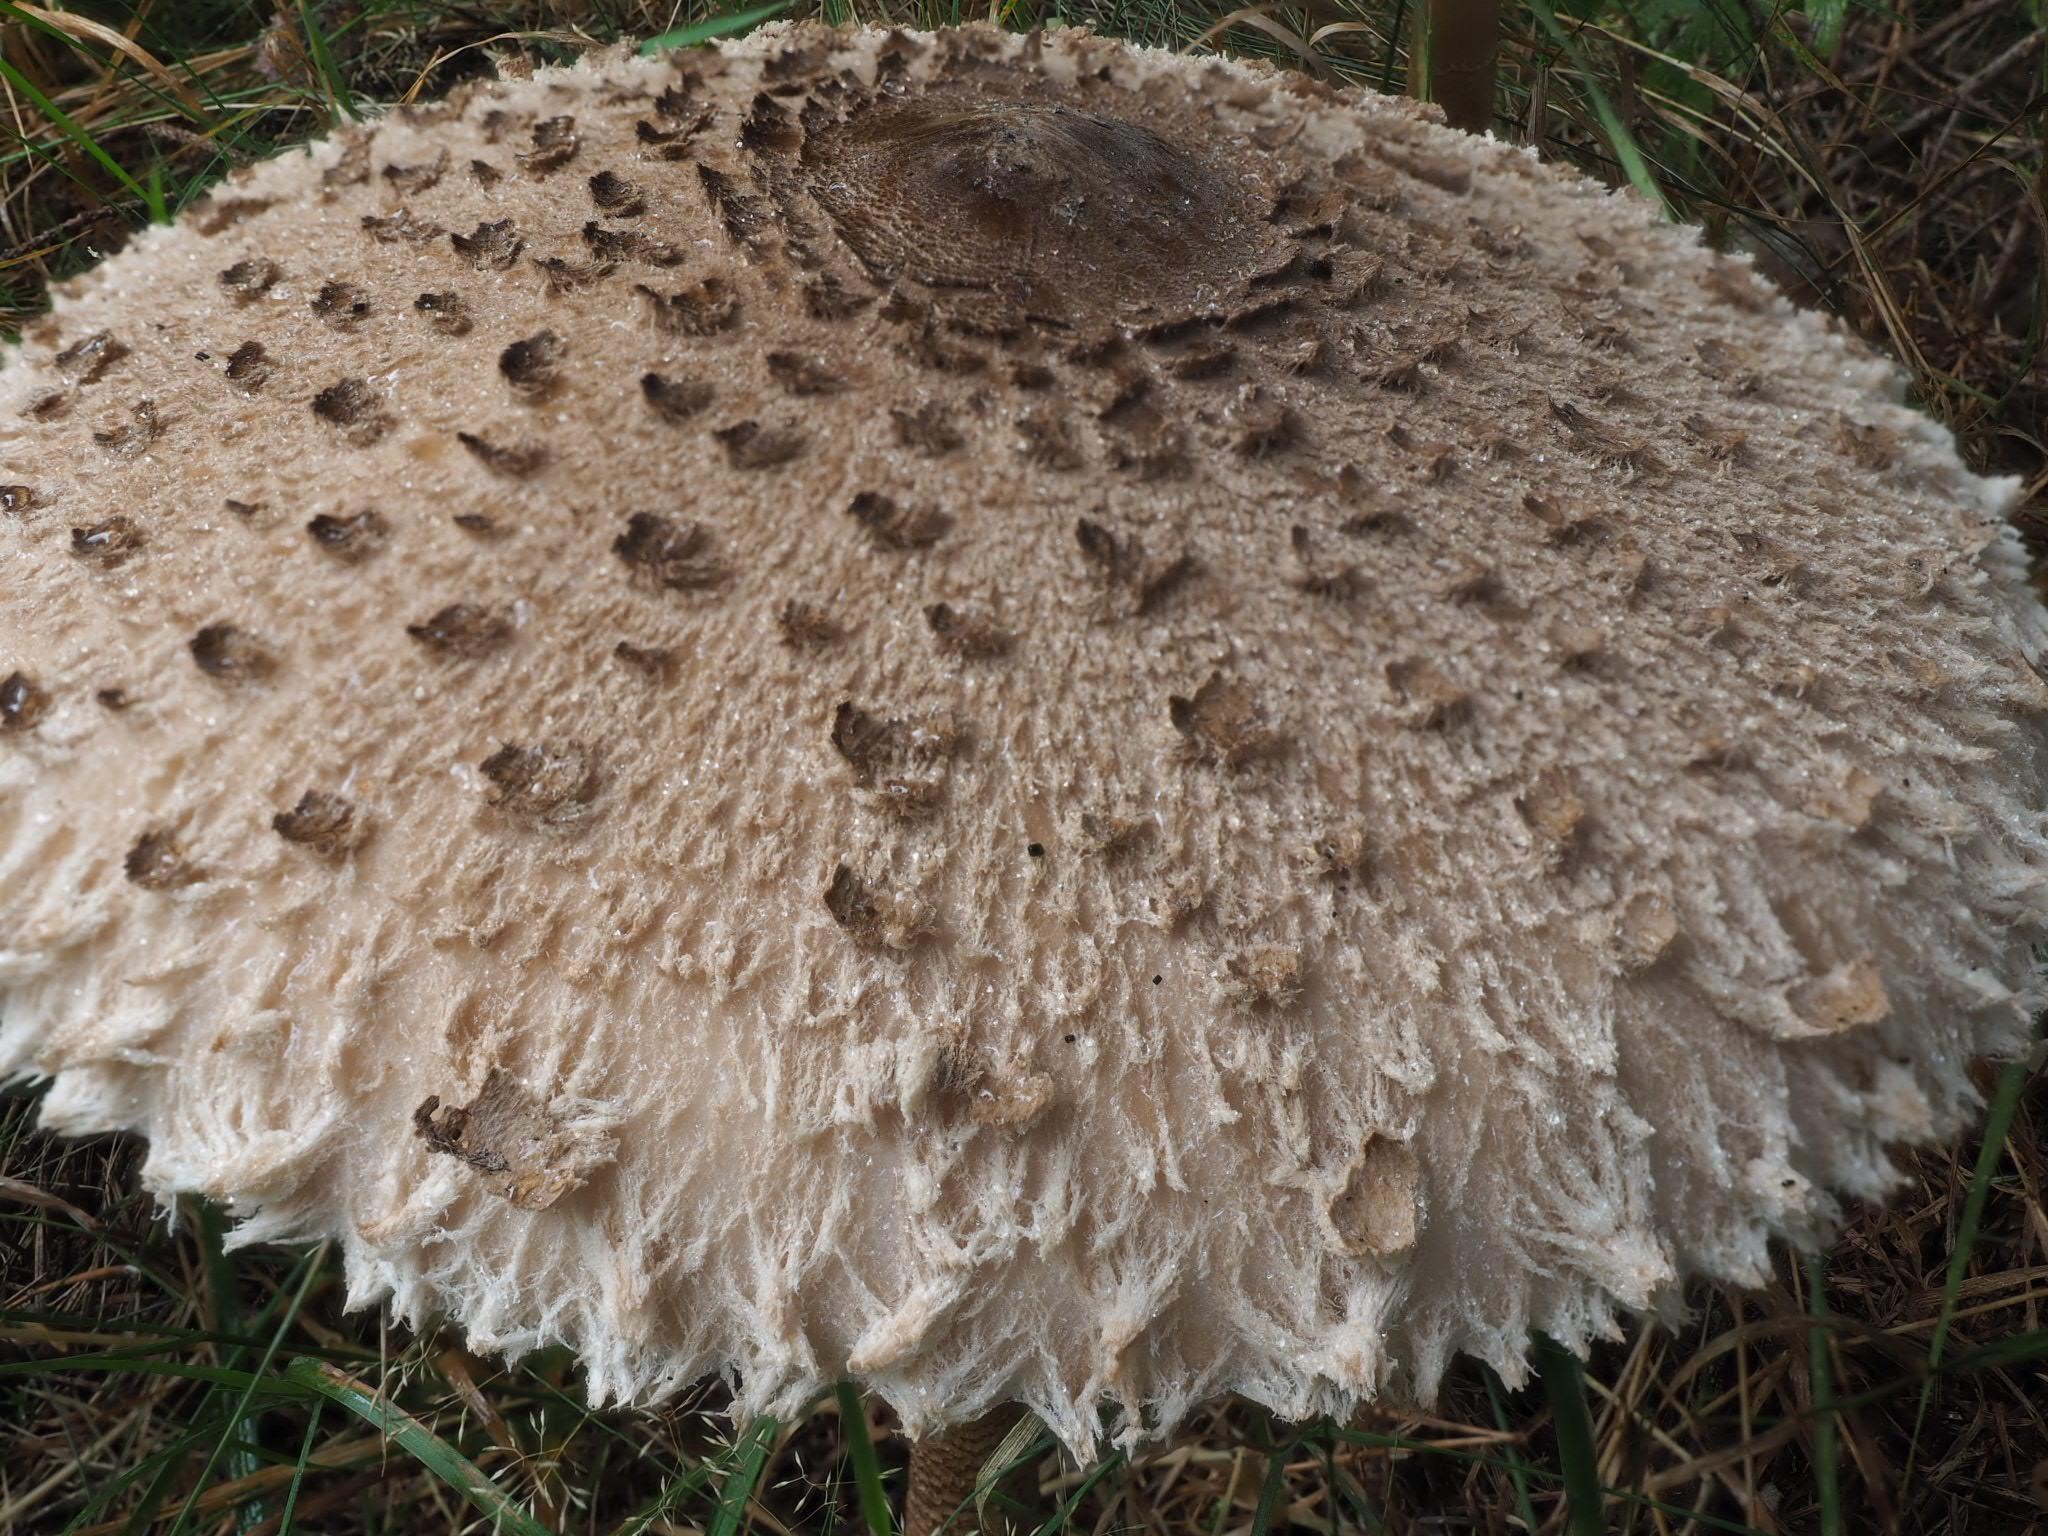 Riesenschirmpilz (Macrolepiota procera) Schuppiger Hut